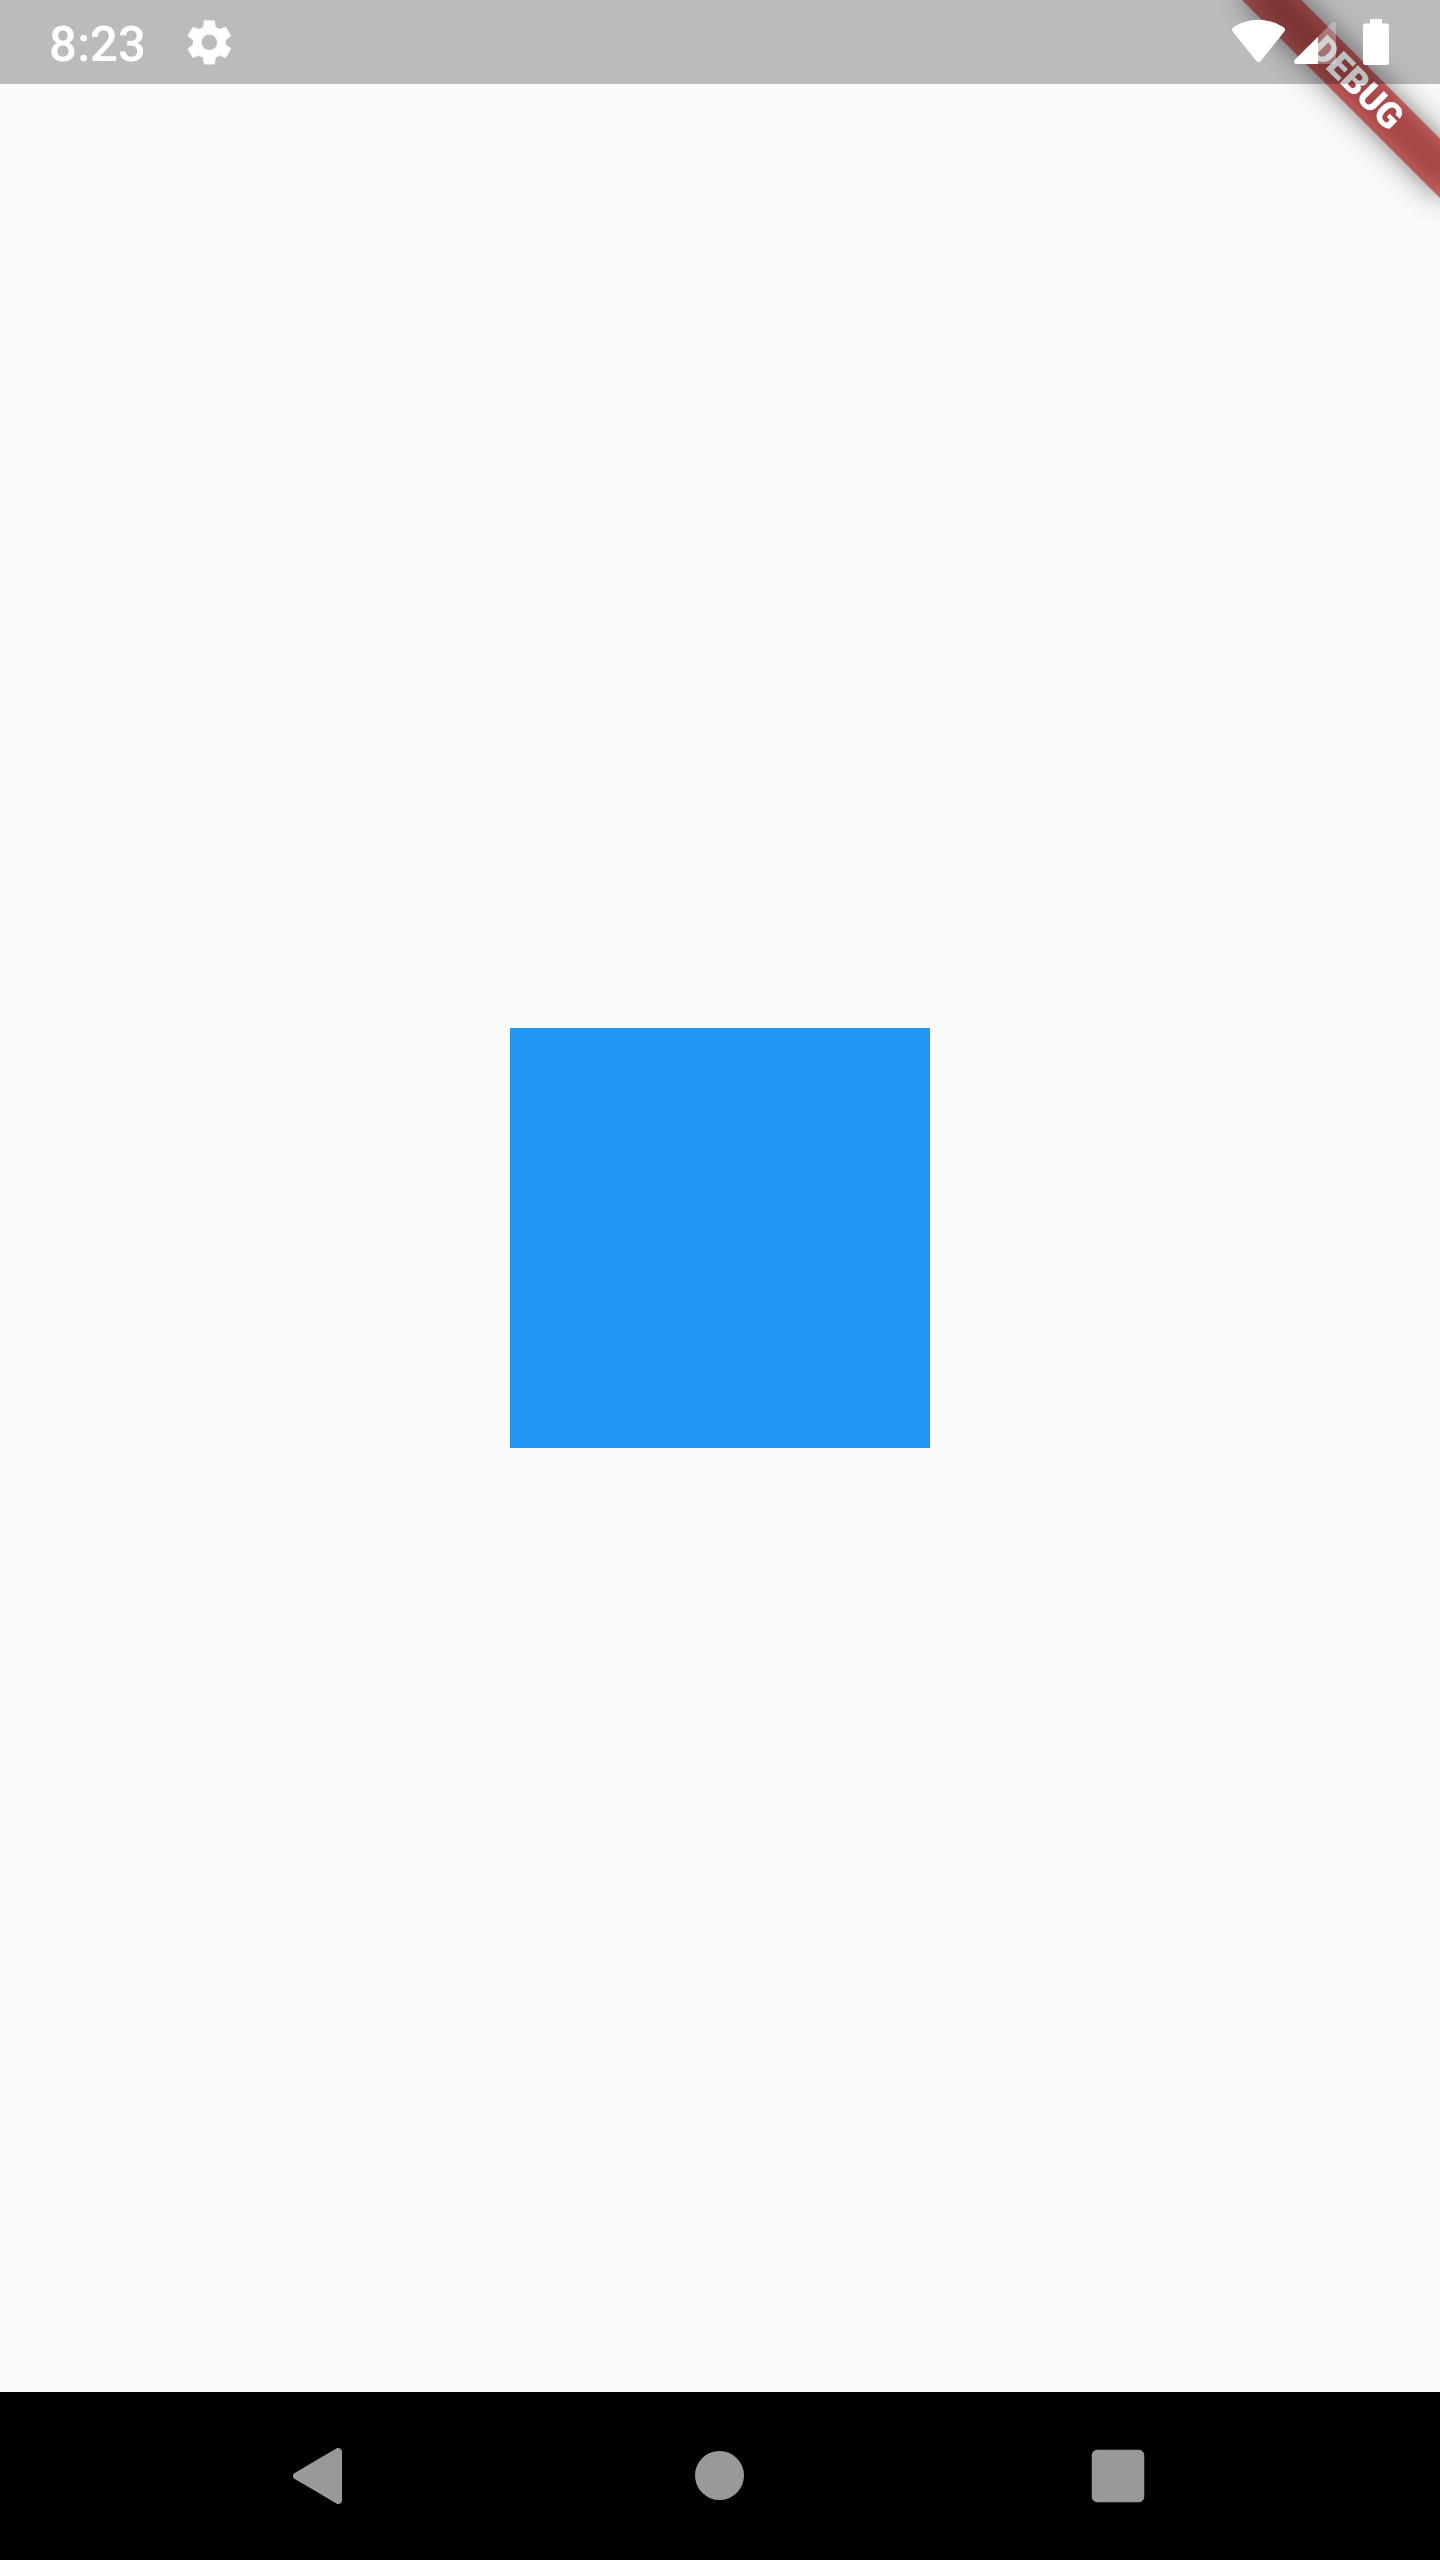 Flutter Align Container Widget Center of Screen Example